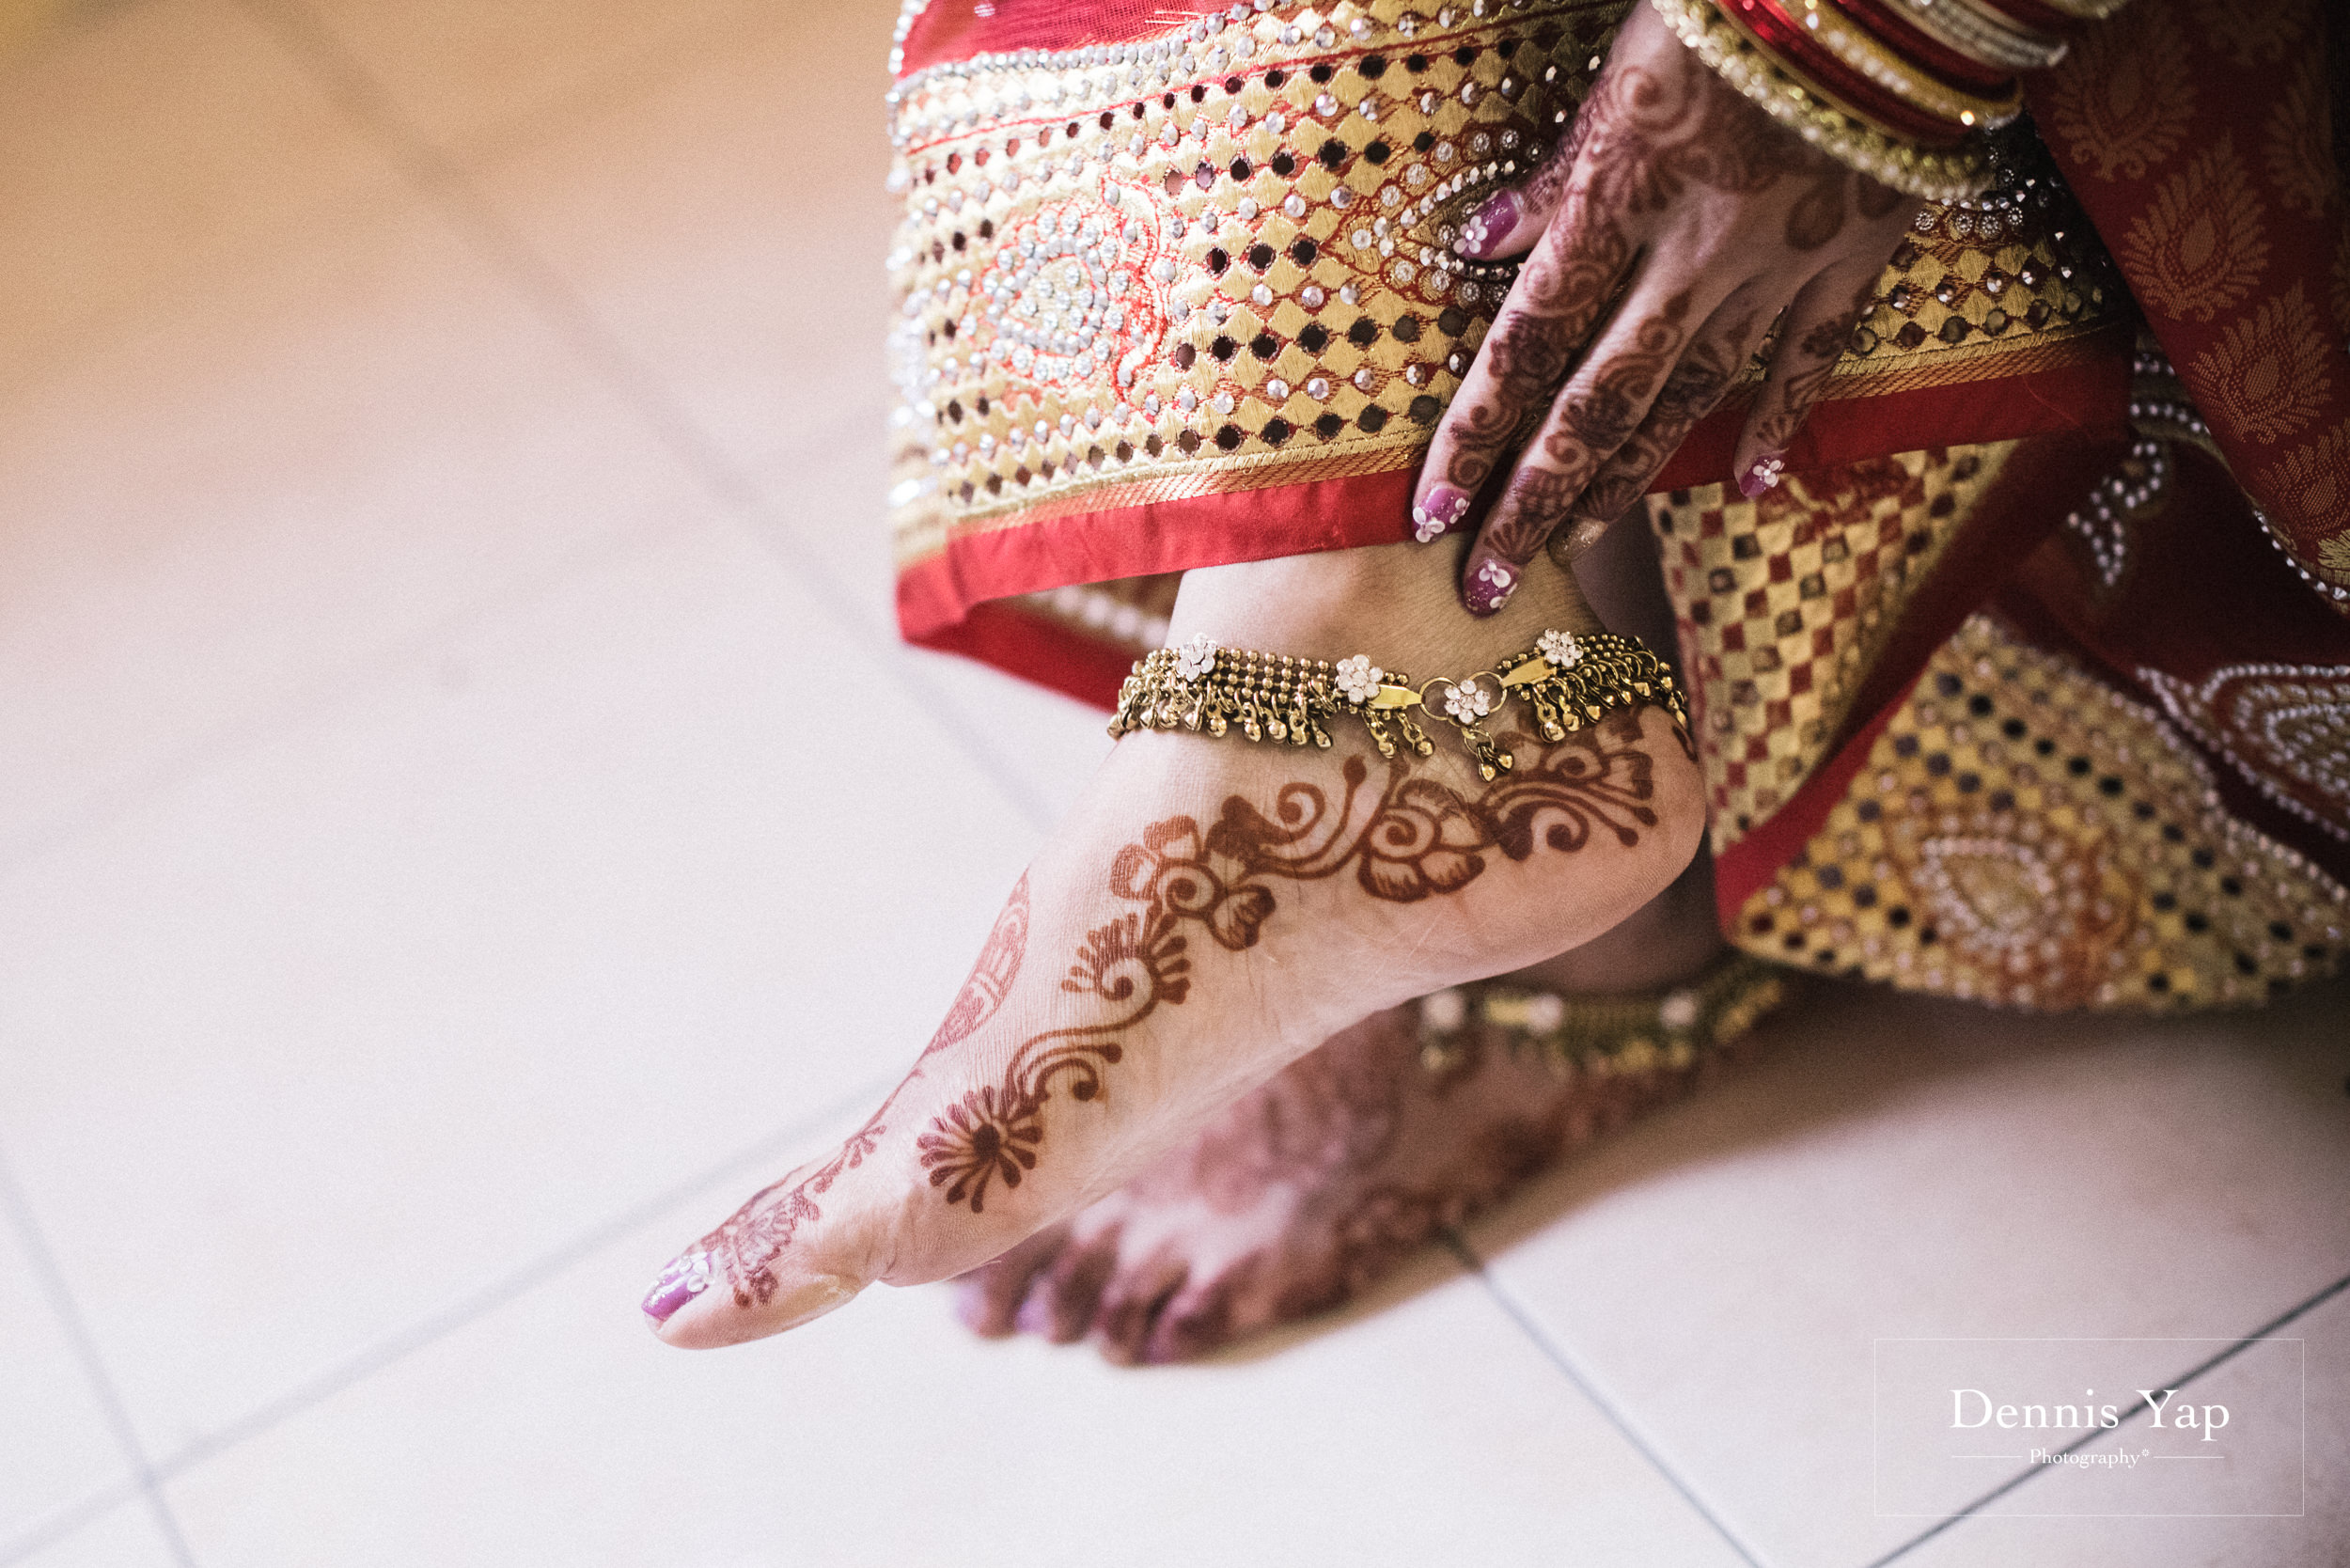 puvaneswaran cangitaa indian wedding ceremony ideal convention dennis yap photography malaysia-2.jpg